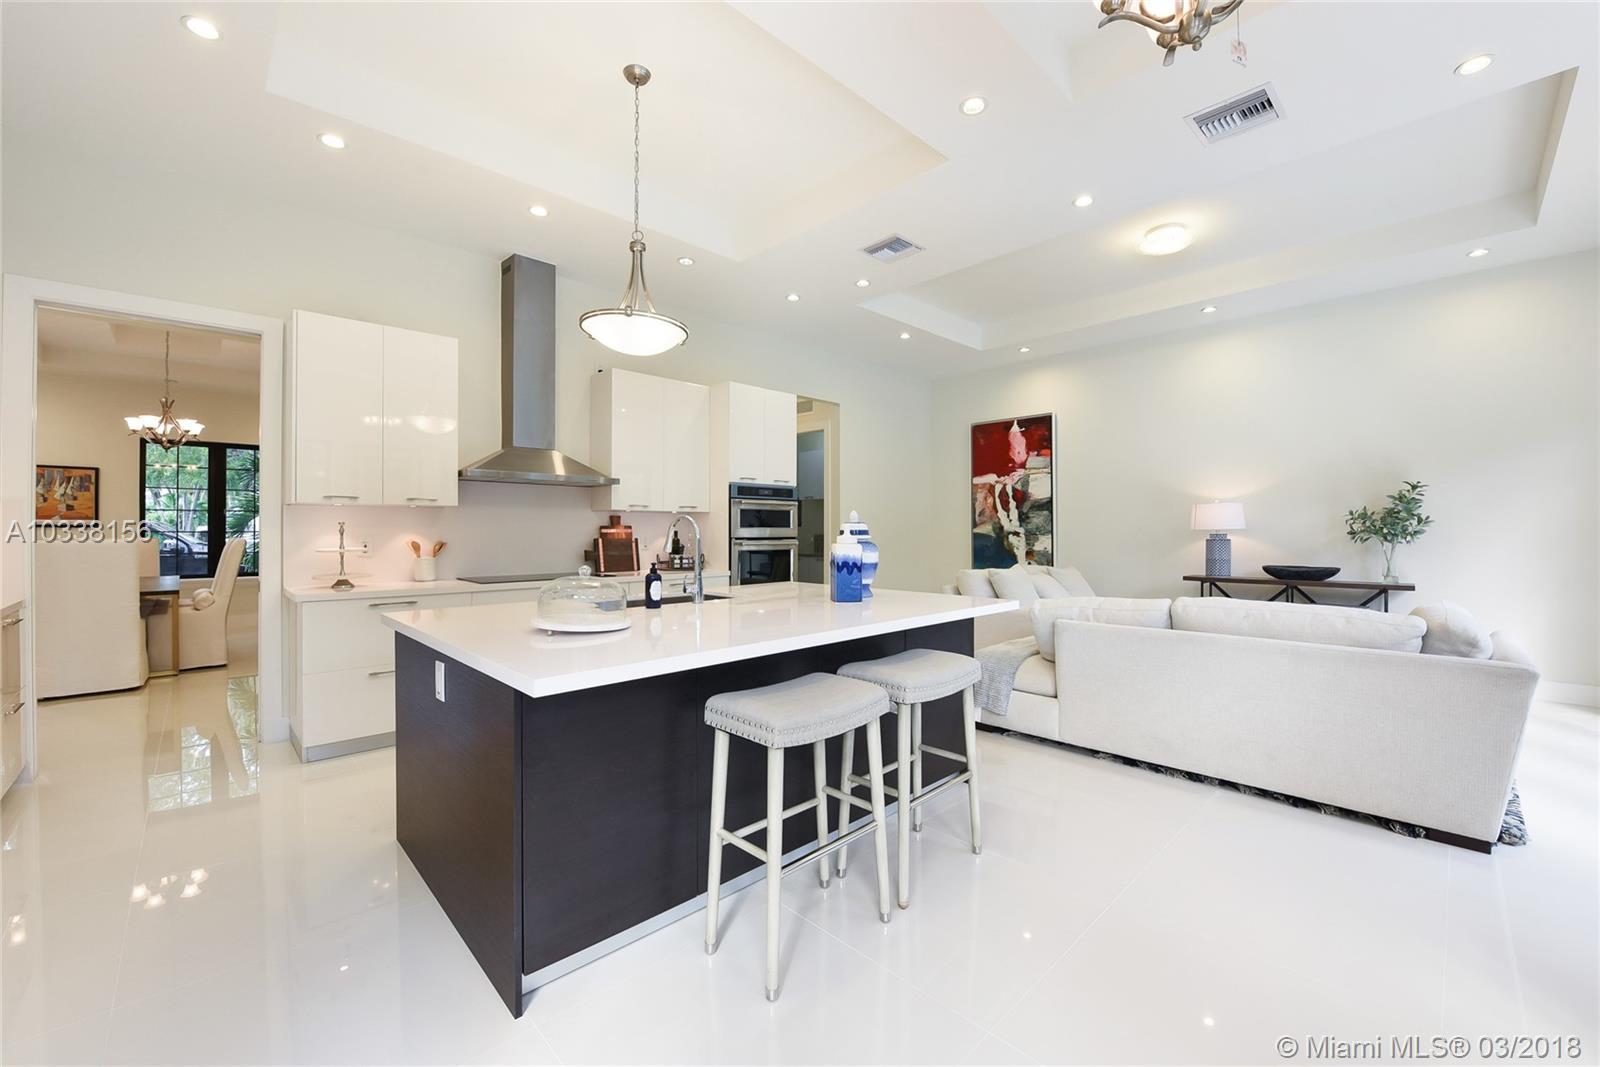 520 Minorca Ave, Coral Gables , FL 33134